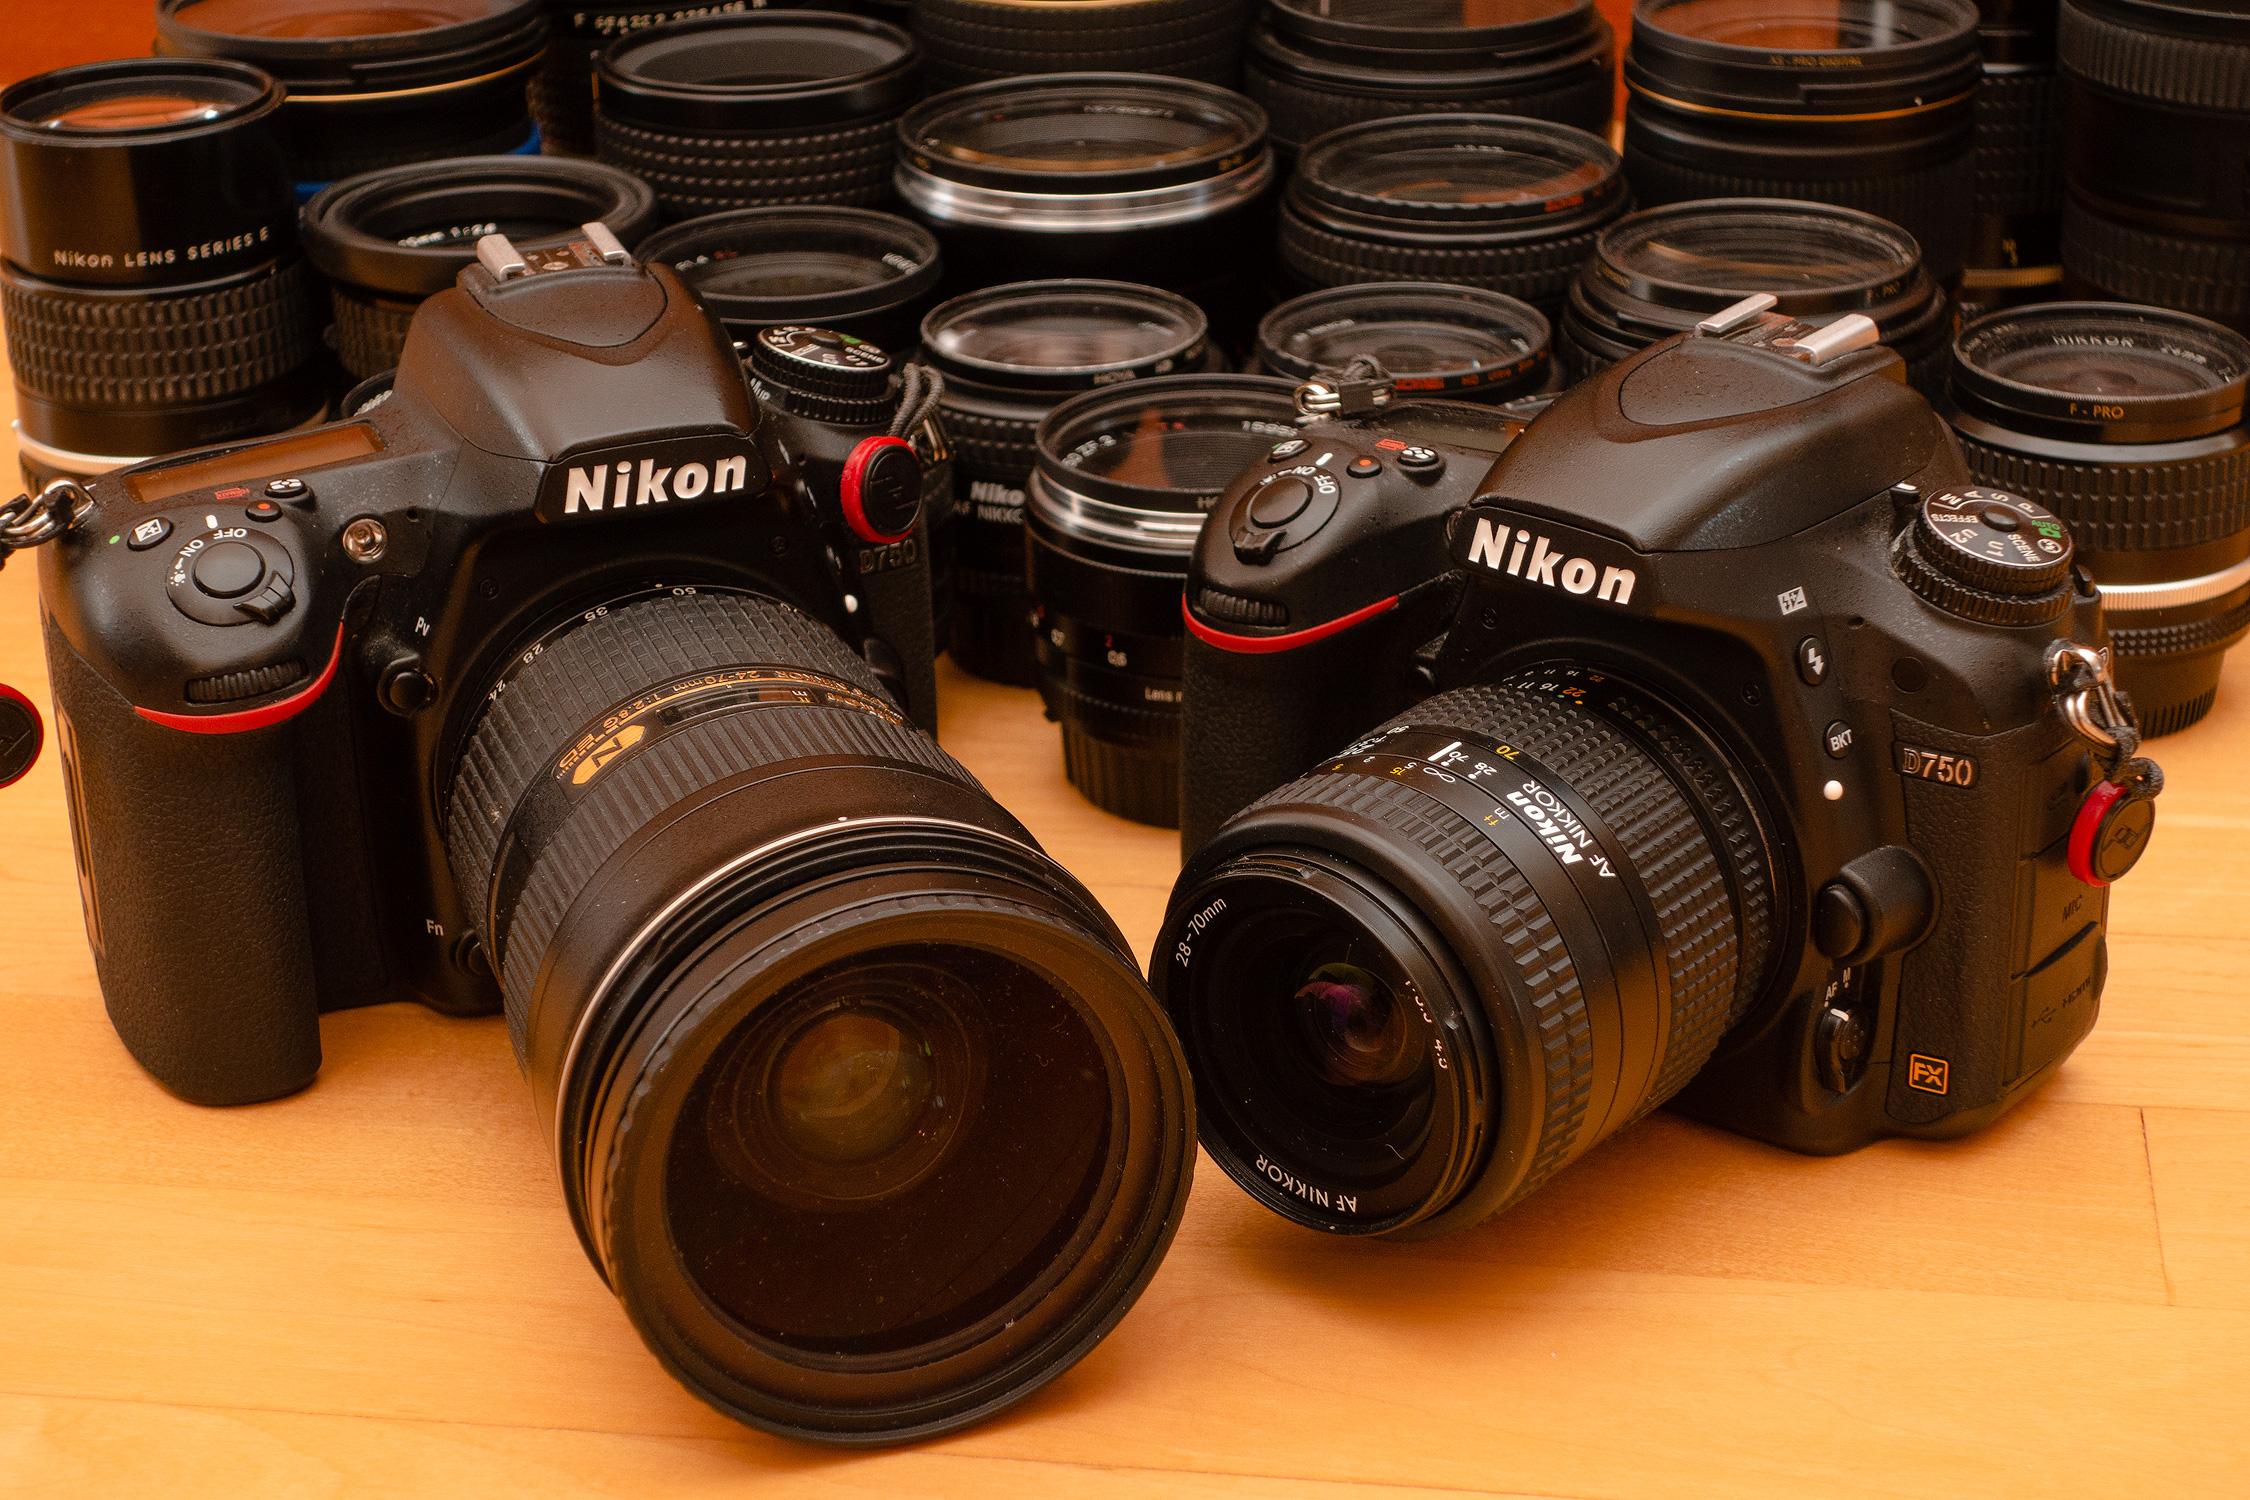 Nikkor AF-S 24-70mm f2.8G ED + Nikkor AF 28-70mm f3.5-4.5, Two amazing examples of zoom with great depth rendition.